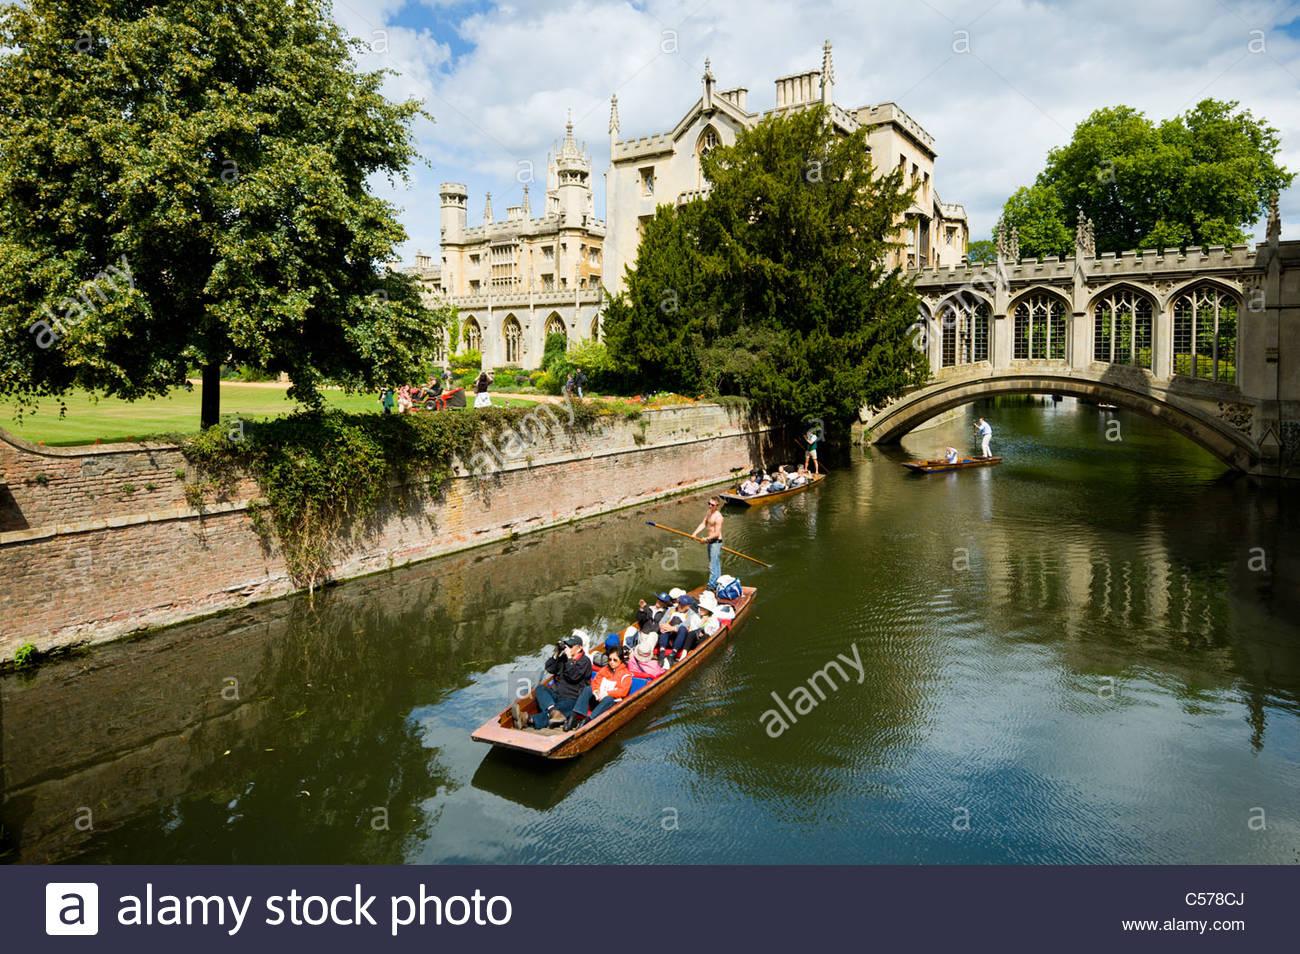 Punting beneath the Bridge of Sighs, St John's college, Cambridge, UK. - Stock Image